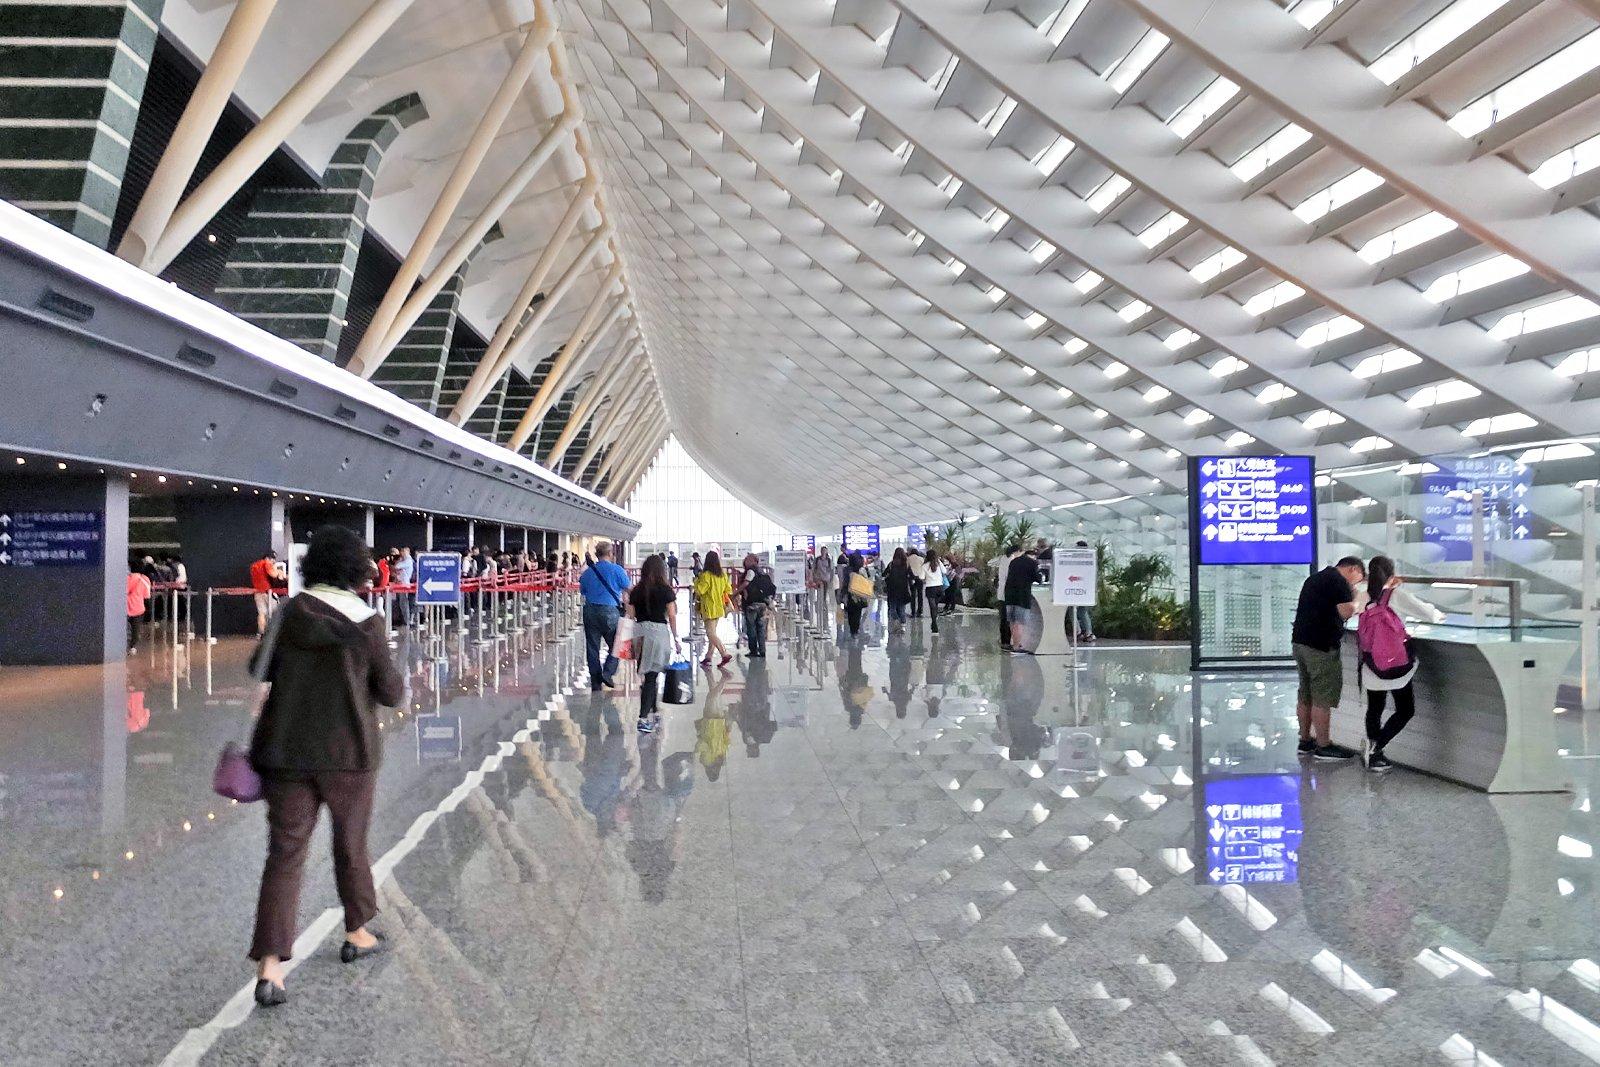 Taipei Airport Information - Taiwan Taoyuan International